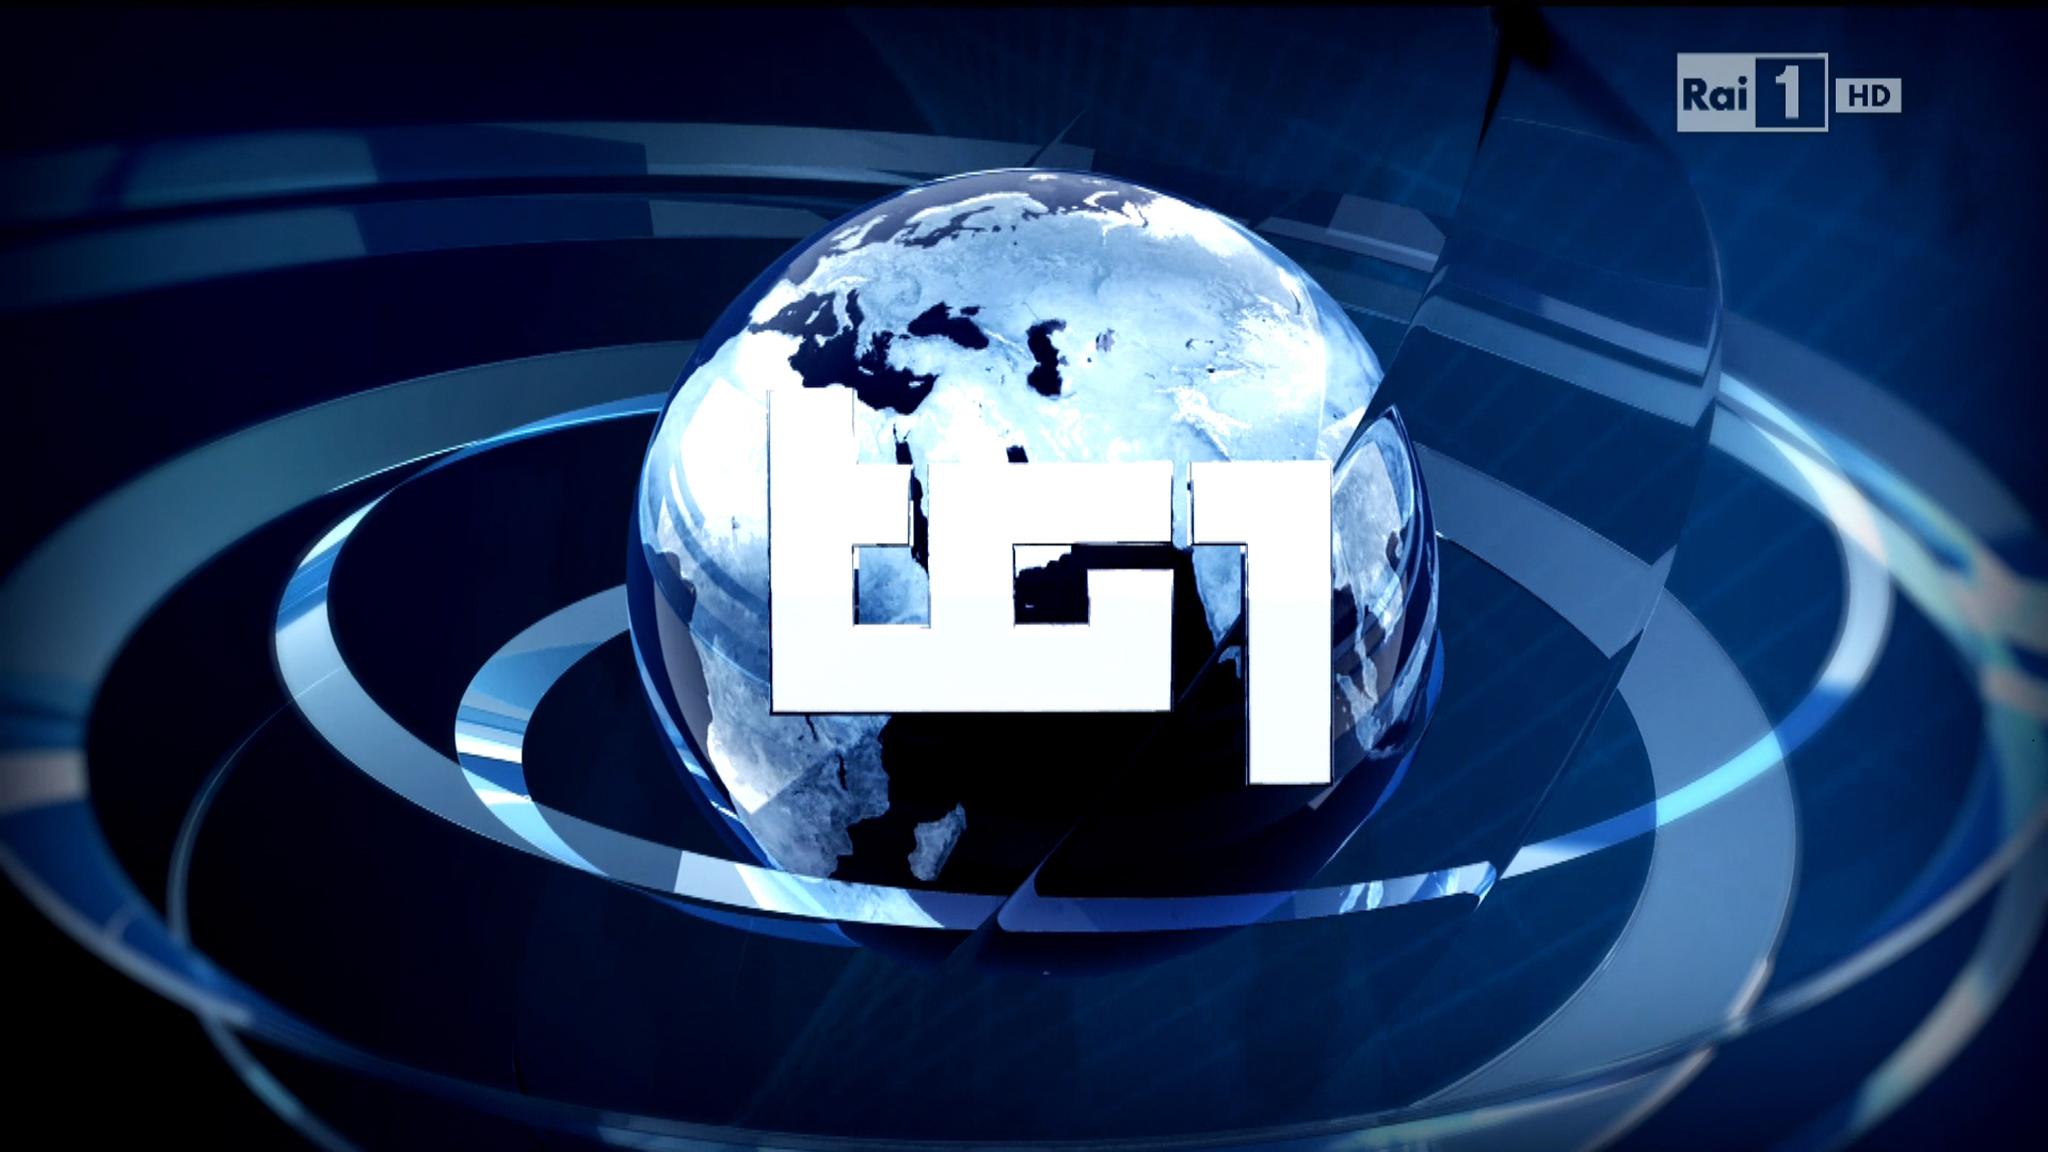 Rai 1 replay TV : programmi TV Rai 1 da rivedere in replay ...